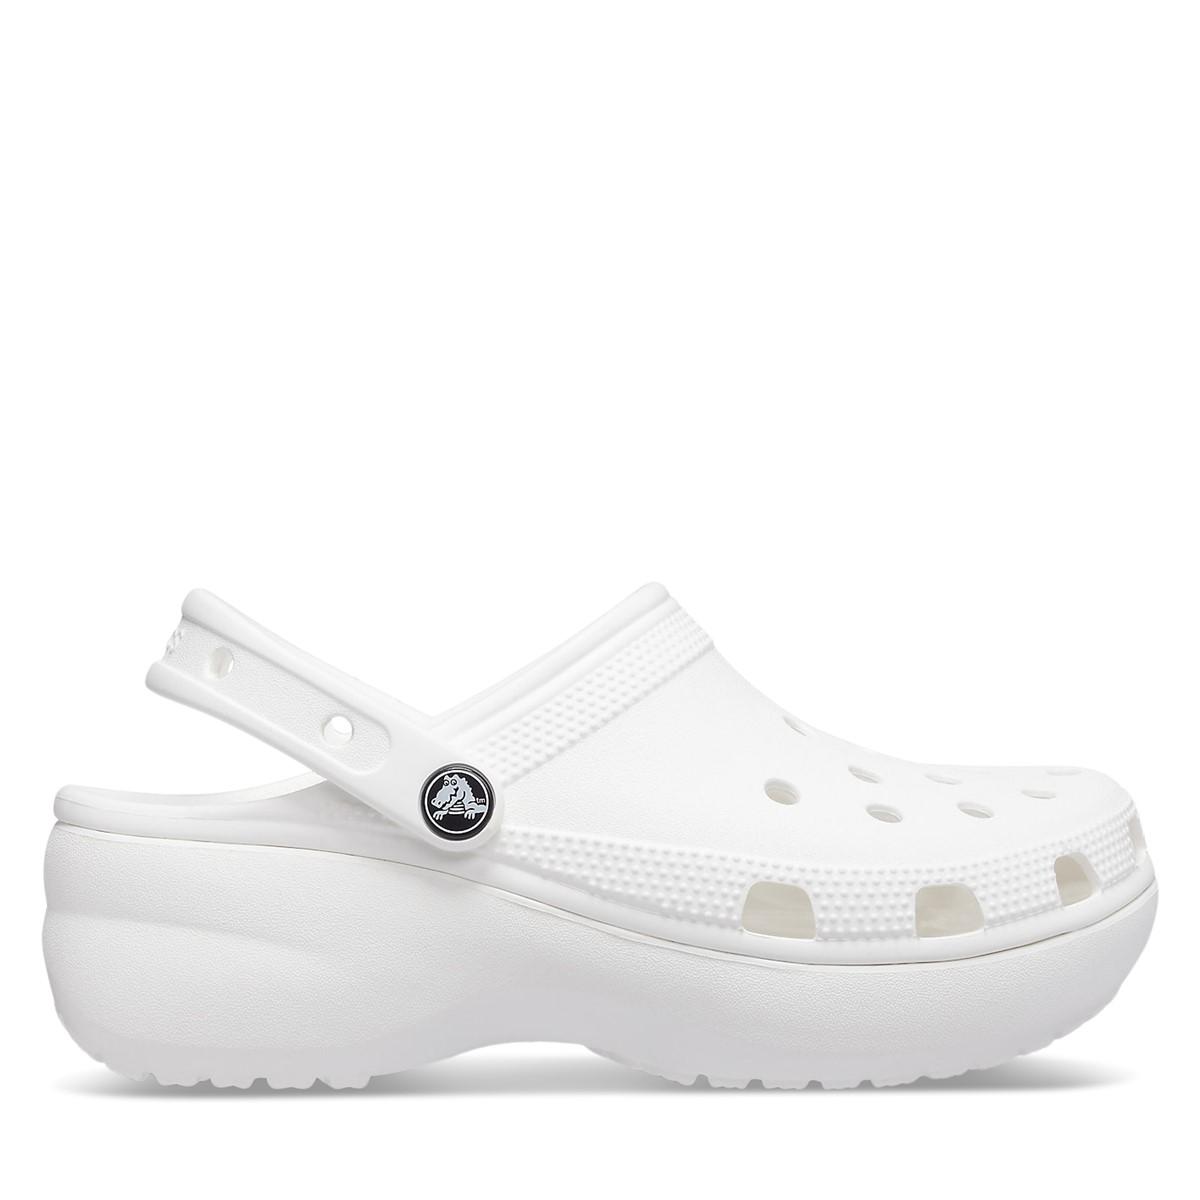 Women's Classic Platform Clogs in White